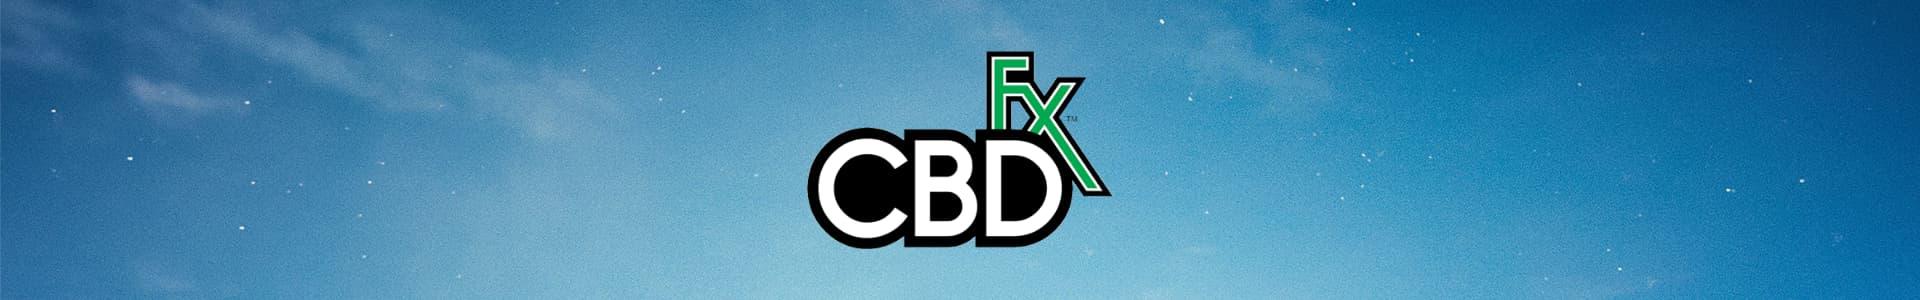 Buy CBDfx Products Online